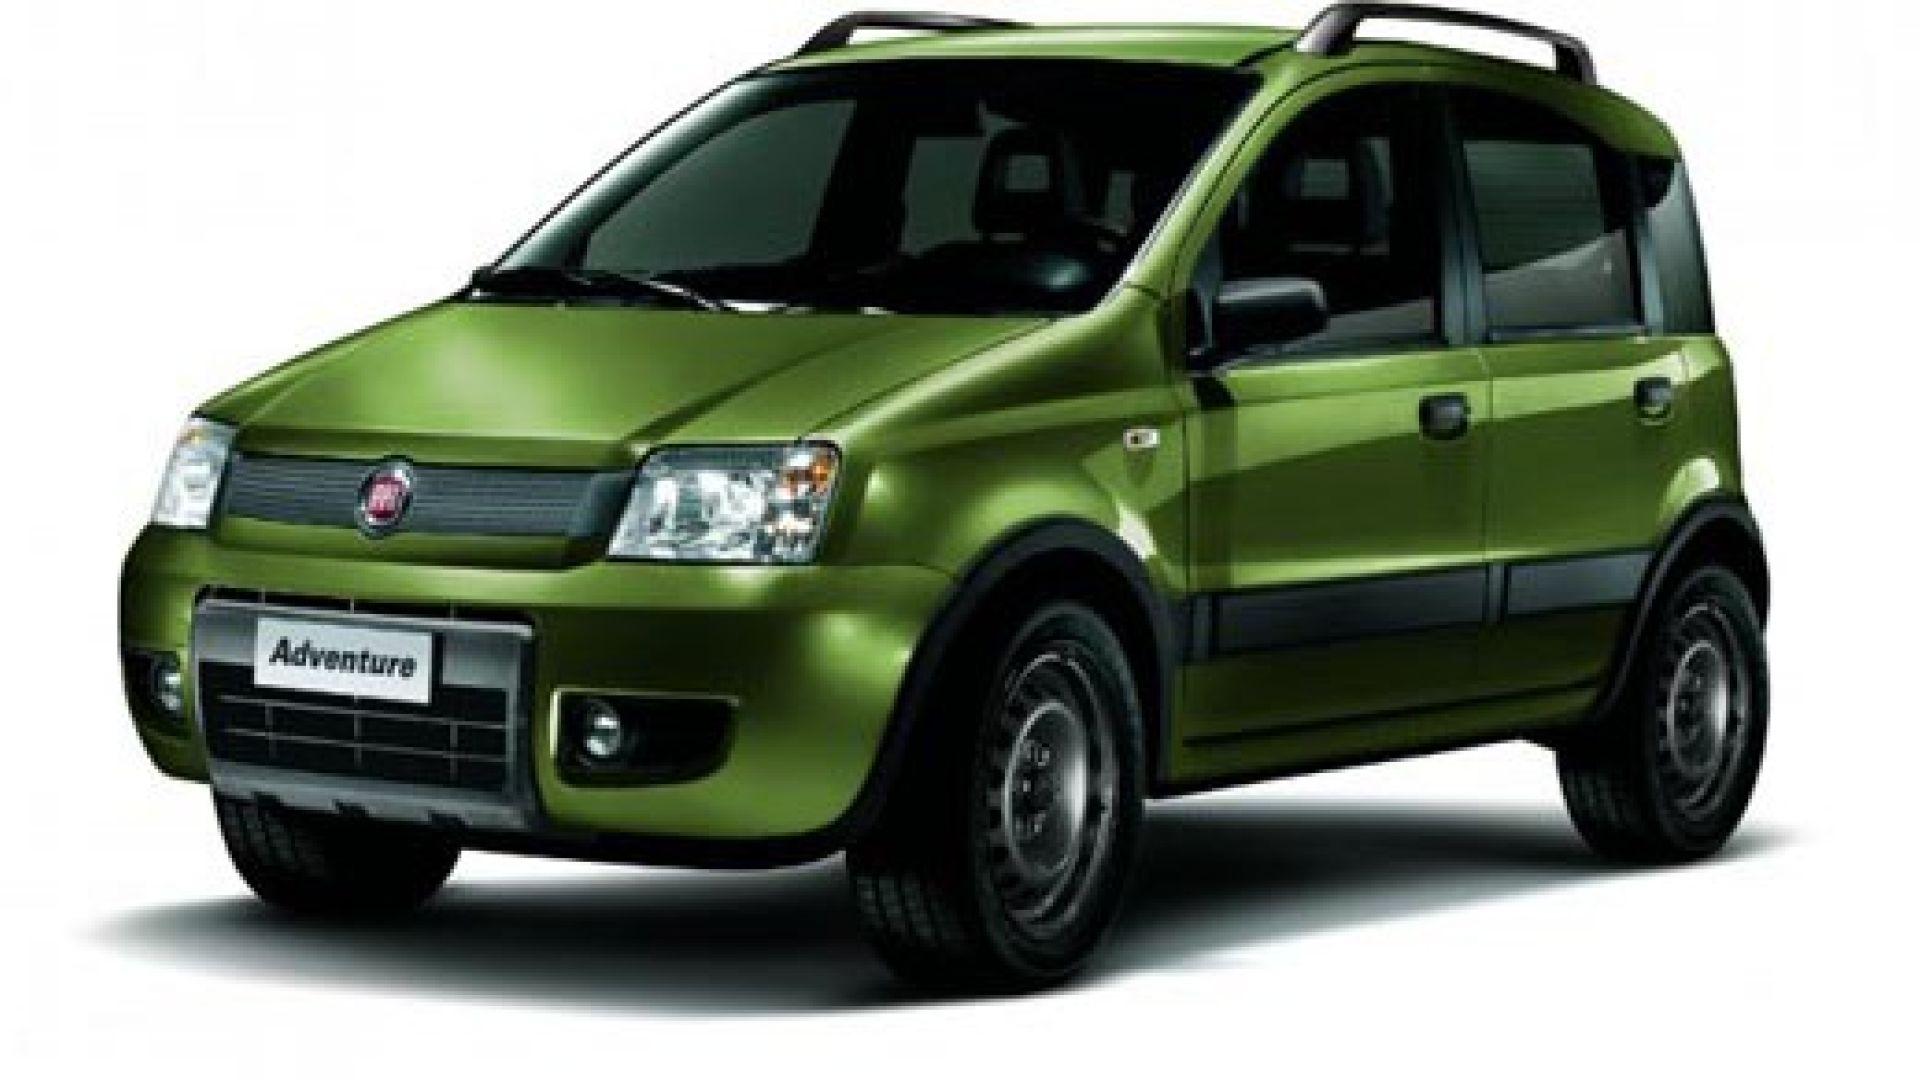 Fiat 500 For Sale >> Anteprima: Fiat Panda 4x4 Adventure - MotorBox